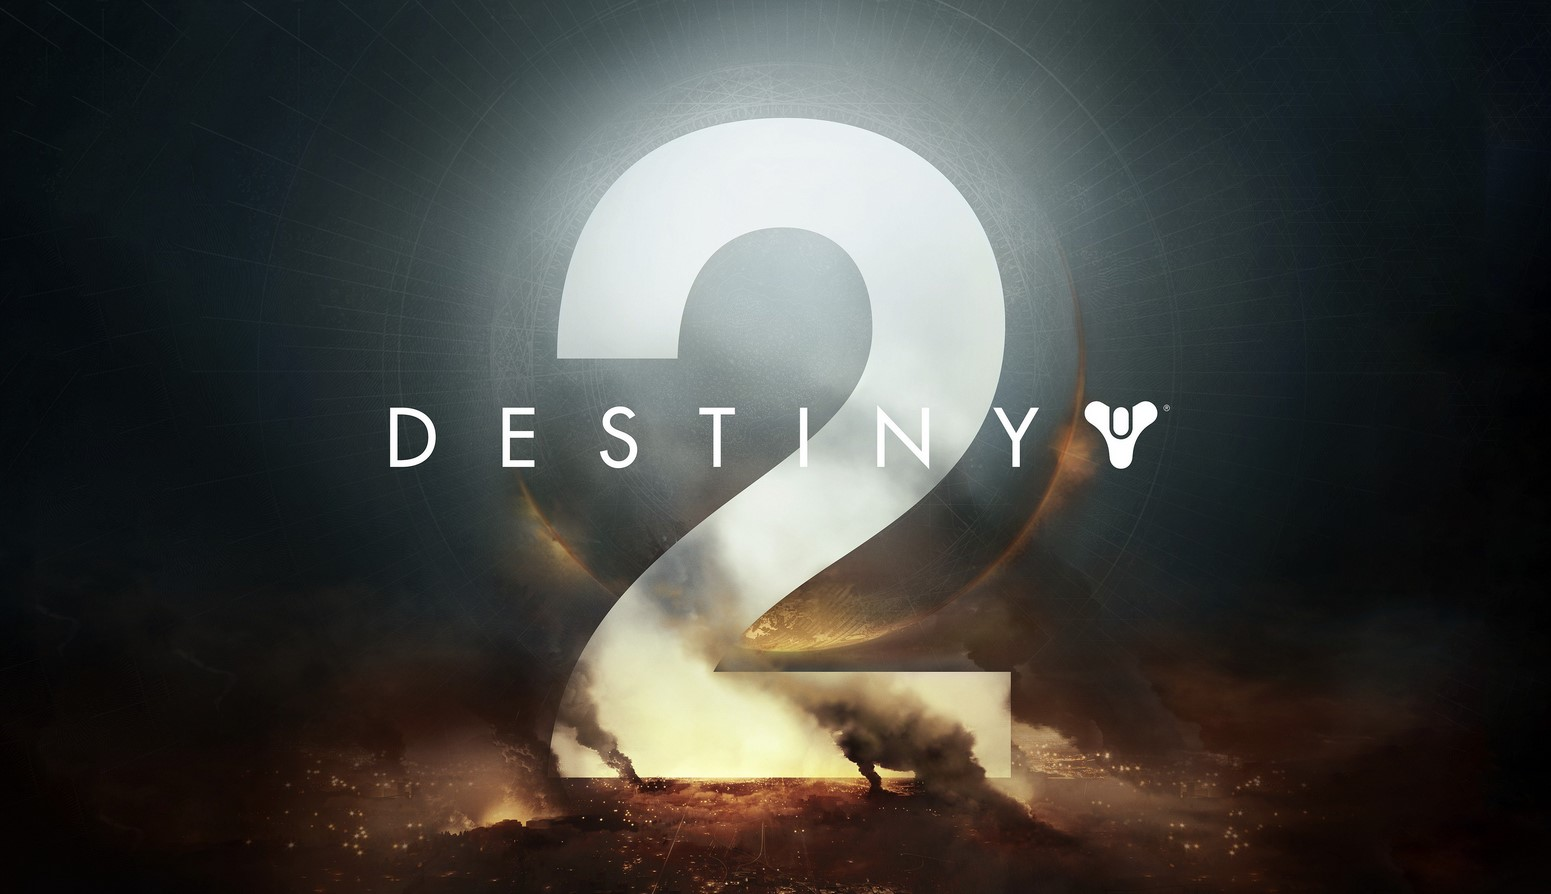 Destiny 2: Trailer, ημερομηνία κυκλοφορίας και όλες οι εκδόσεις